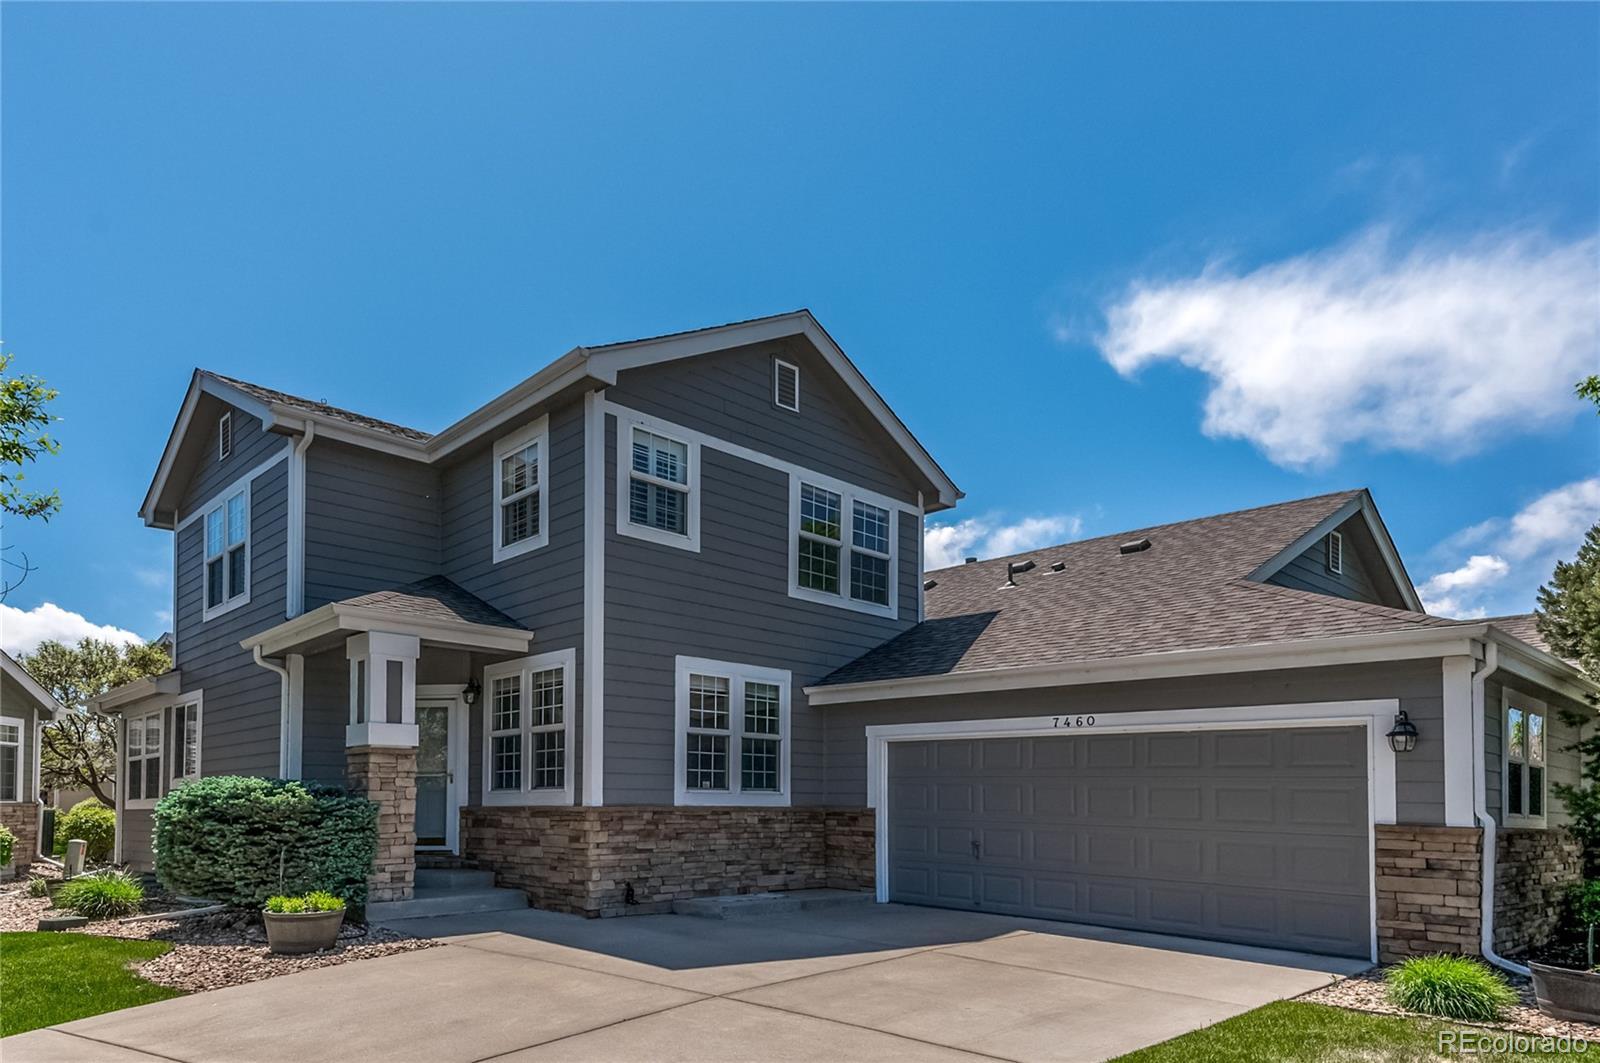 7460 W Layton Way Property Photo - Littleton, CO real estate listing